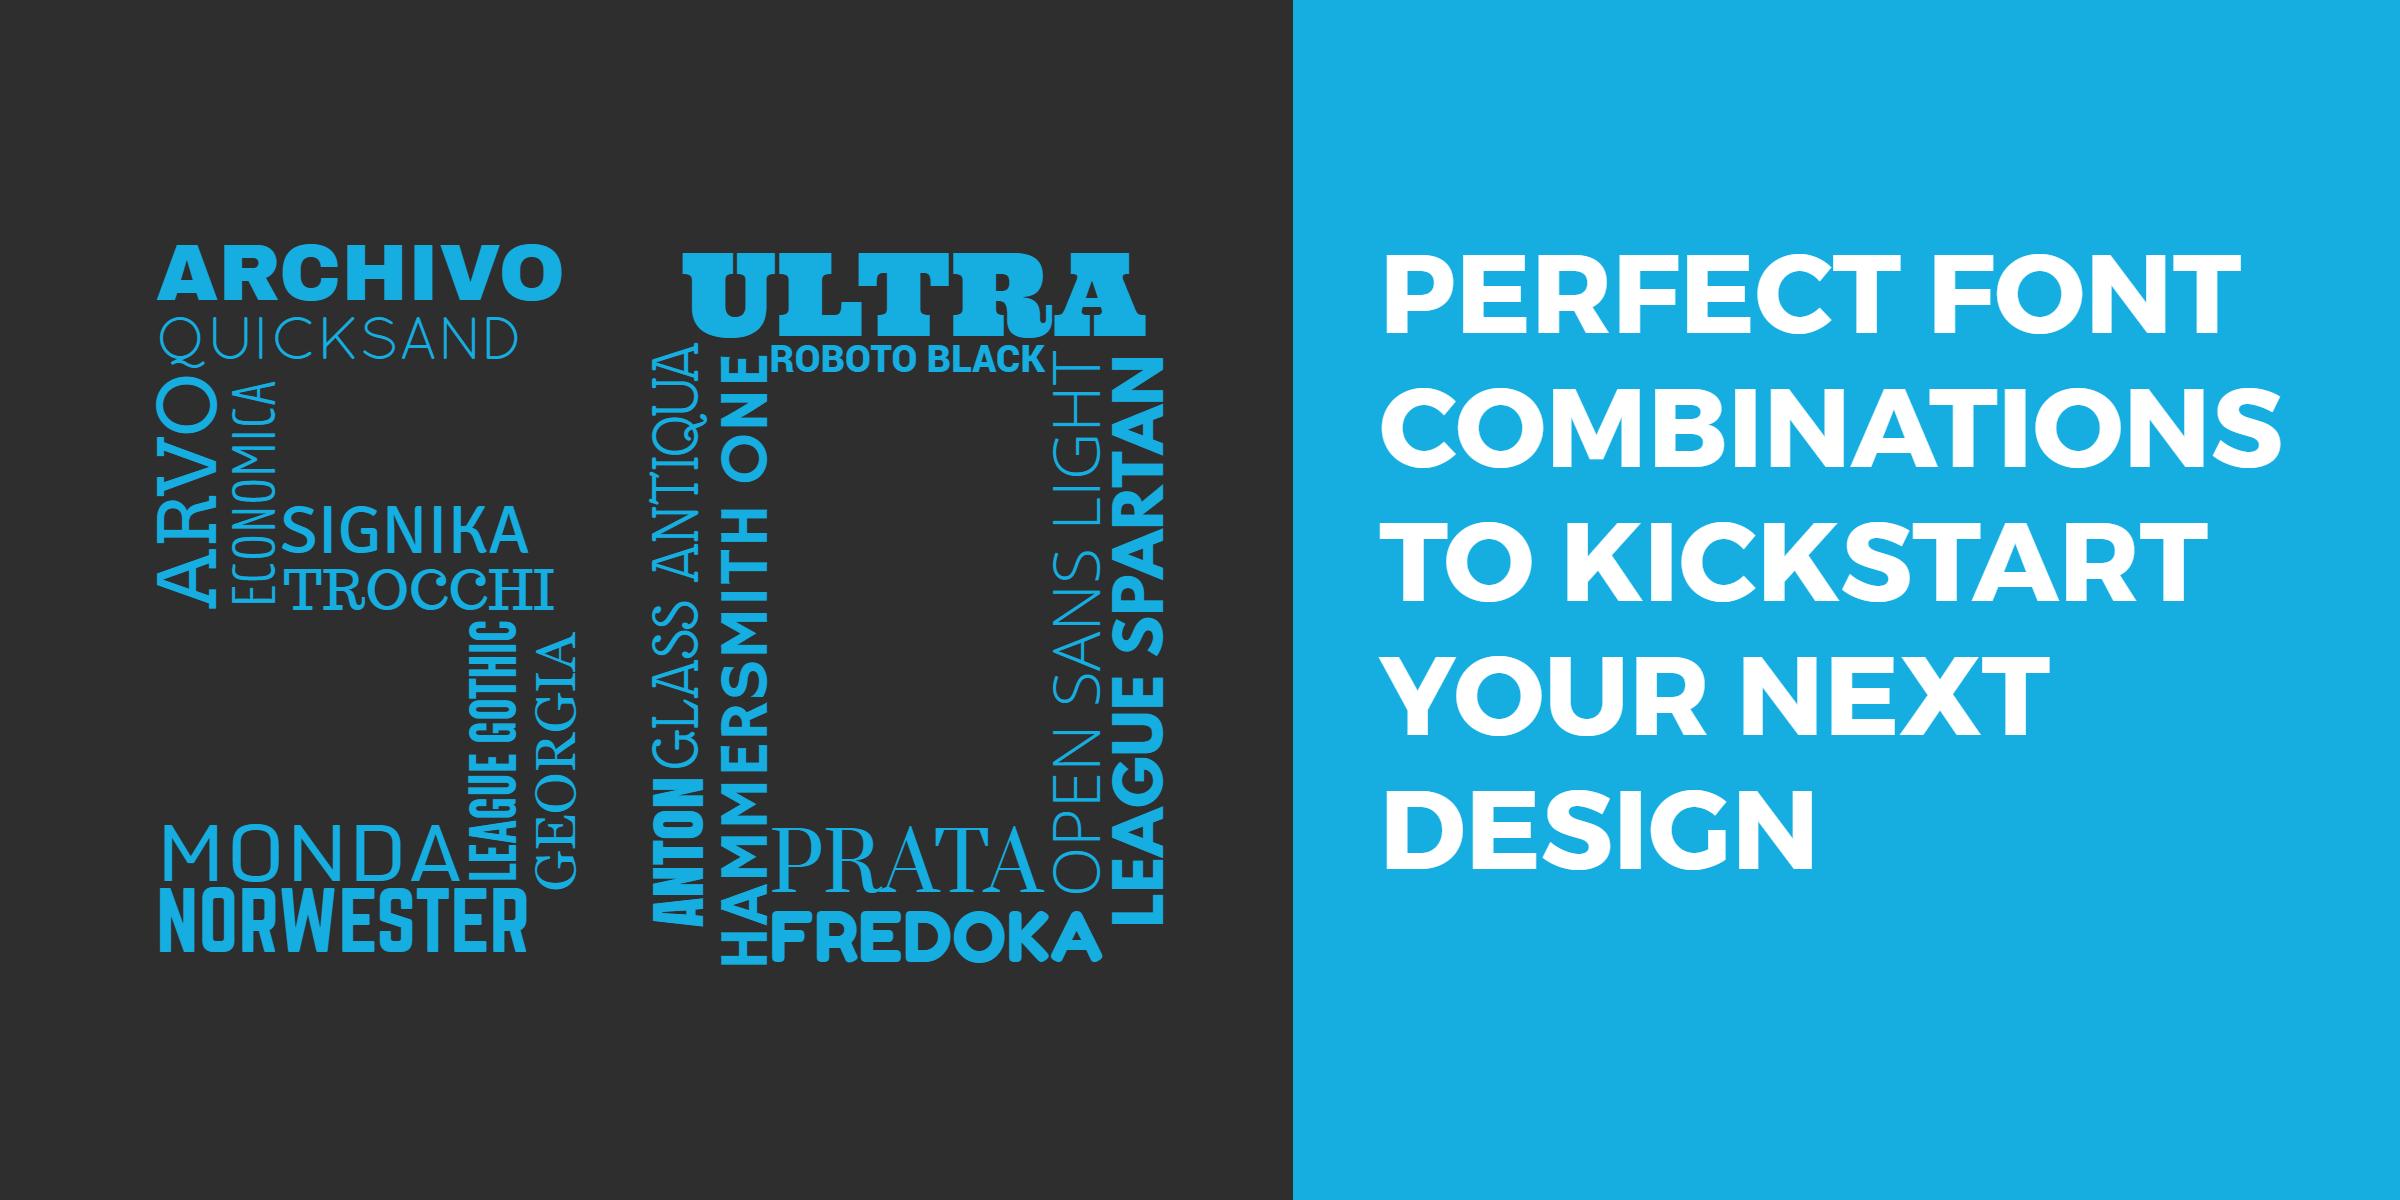 50 Perfect Font Combinations to Kickstart Your Next Design